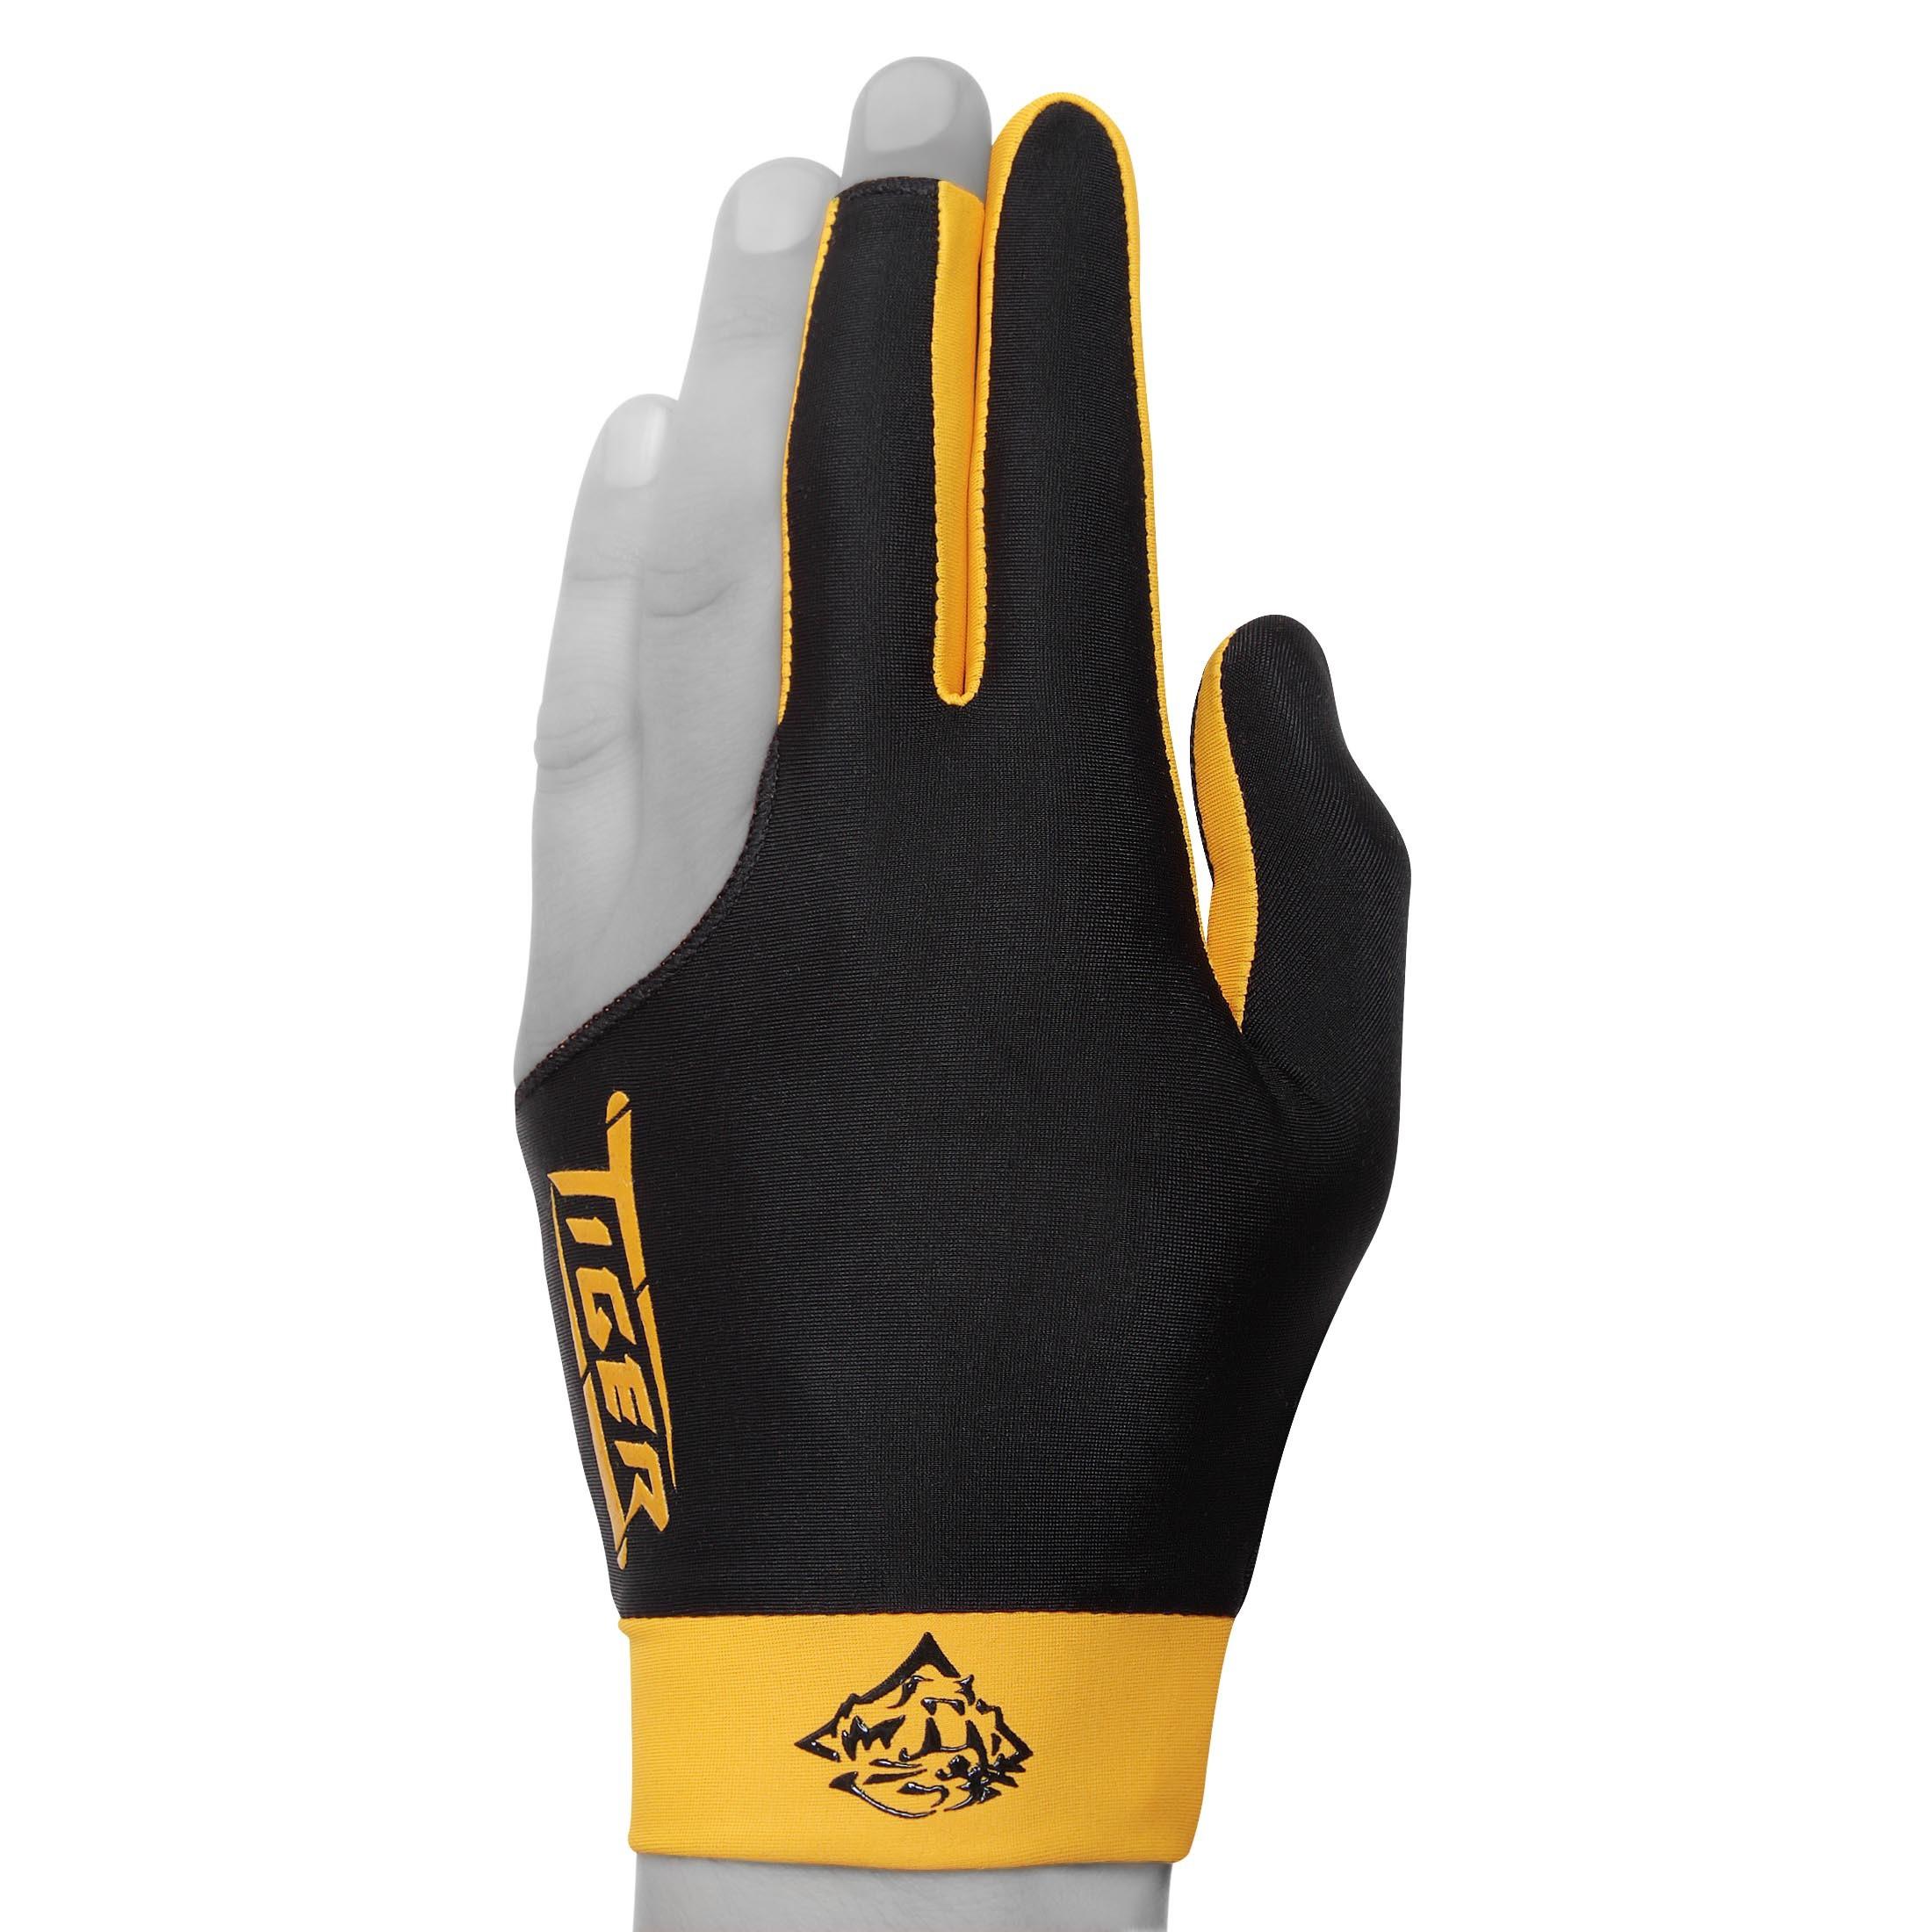 Перчатка Tiger Professional Billiard Glove L